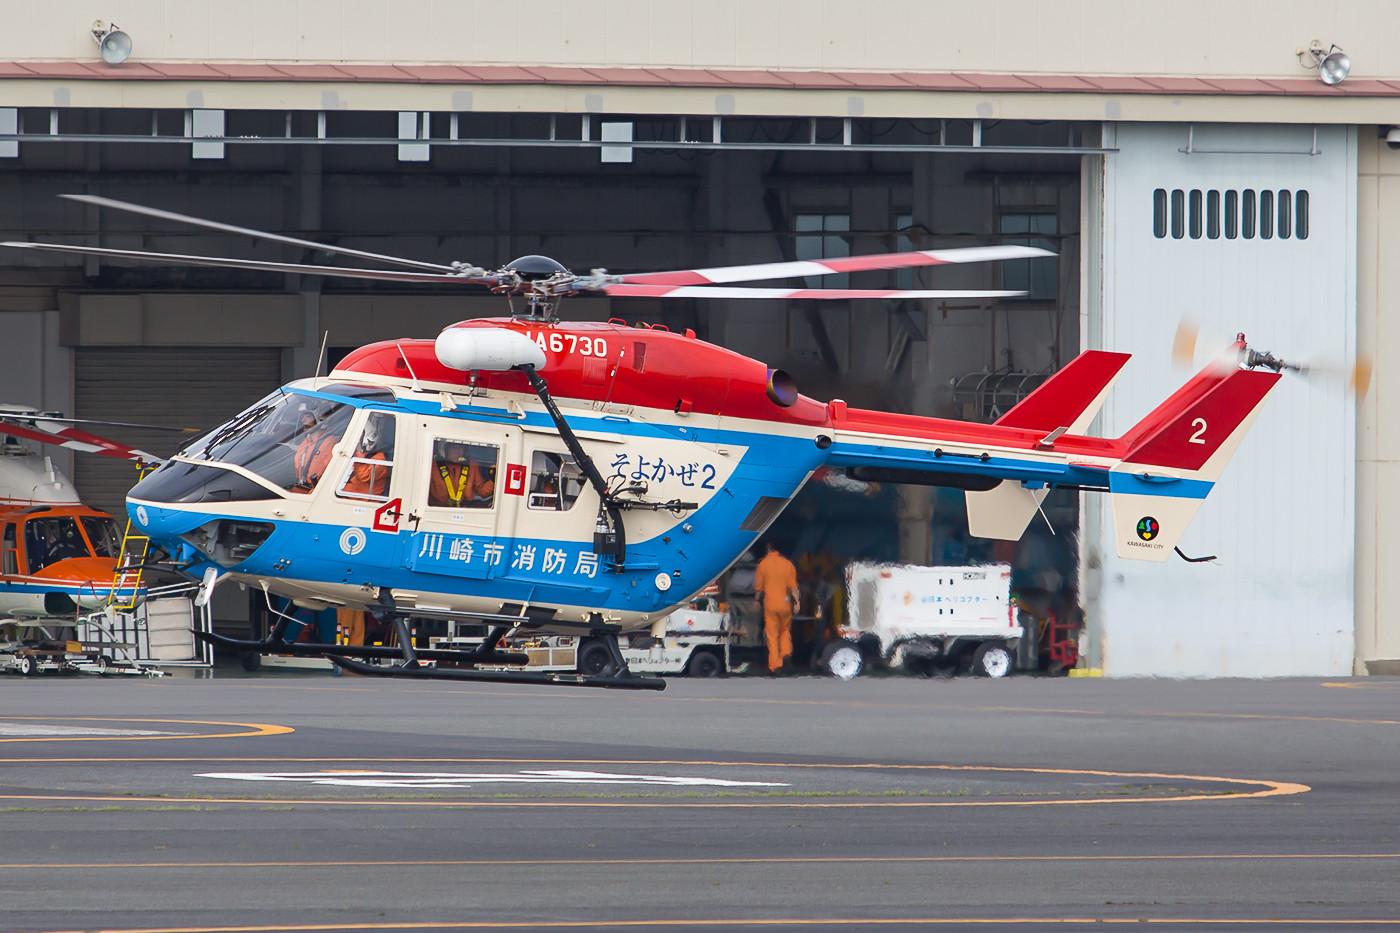 BK-117 B2 der Kawasaki City Fire Brigade.